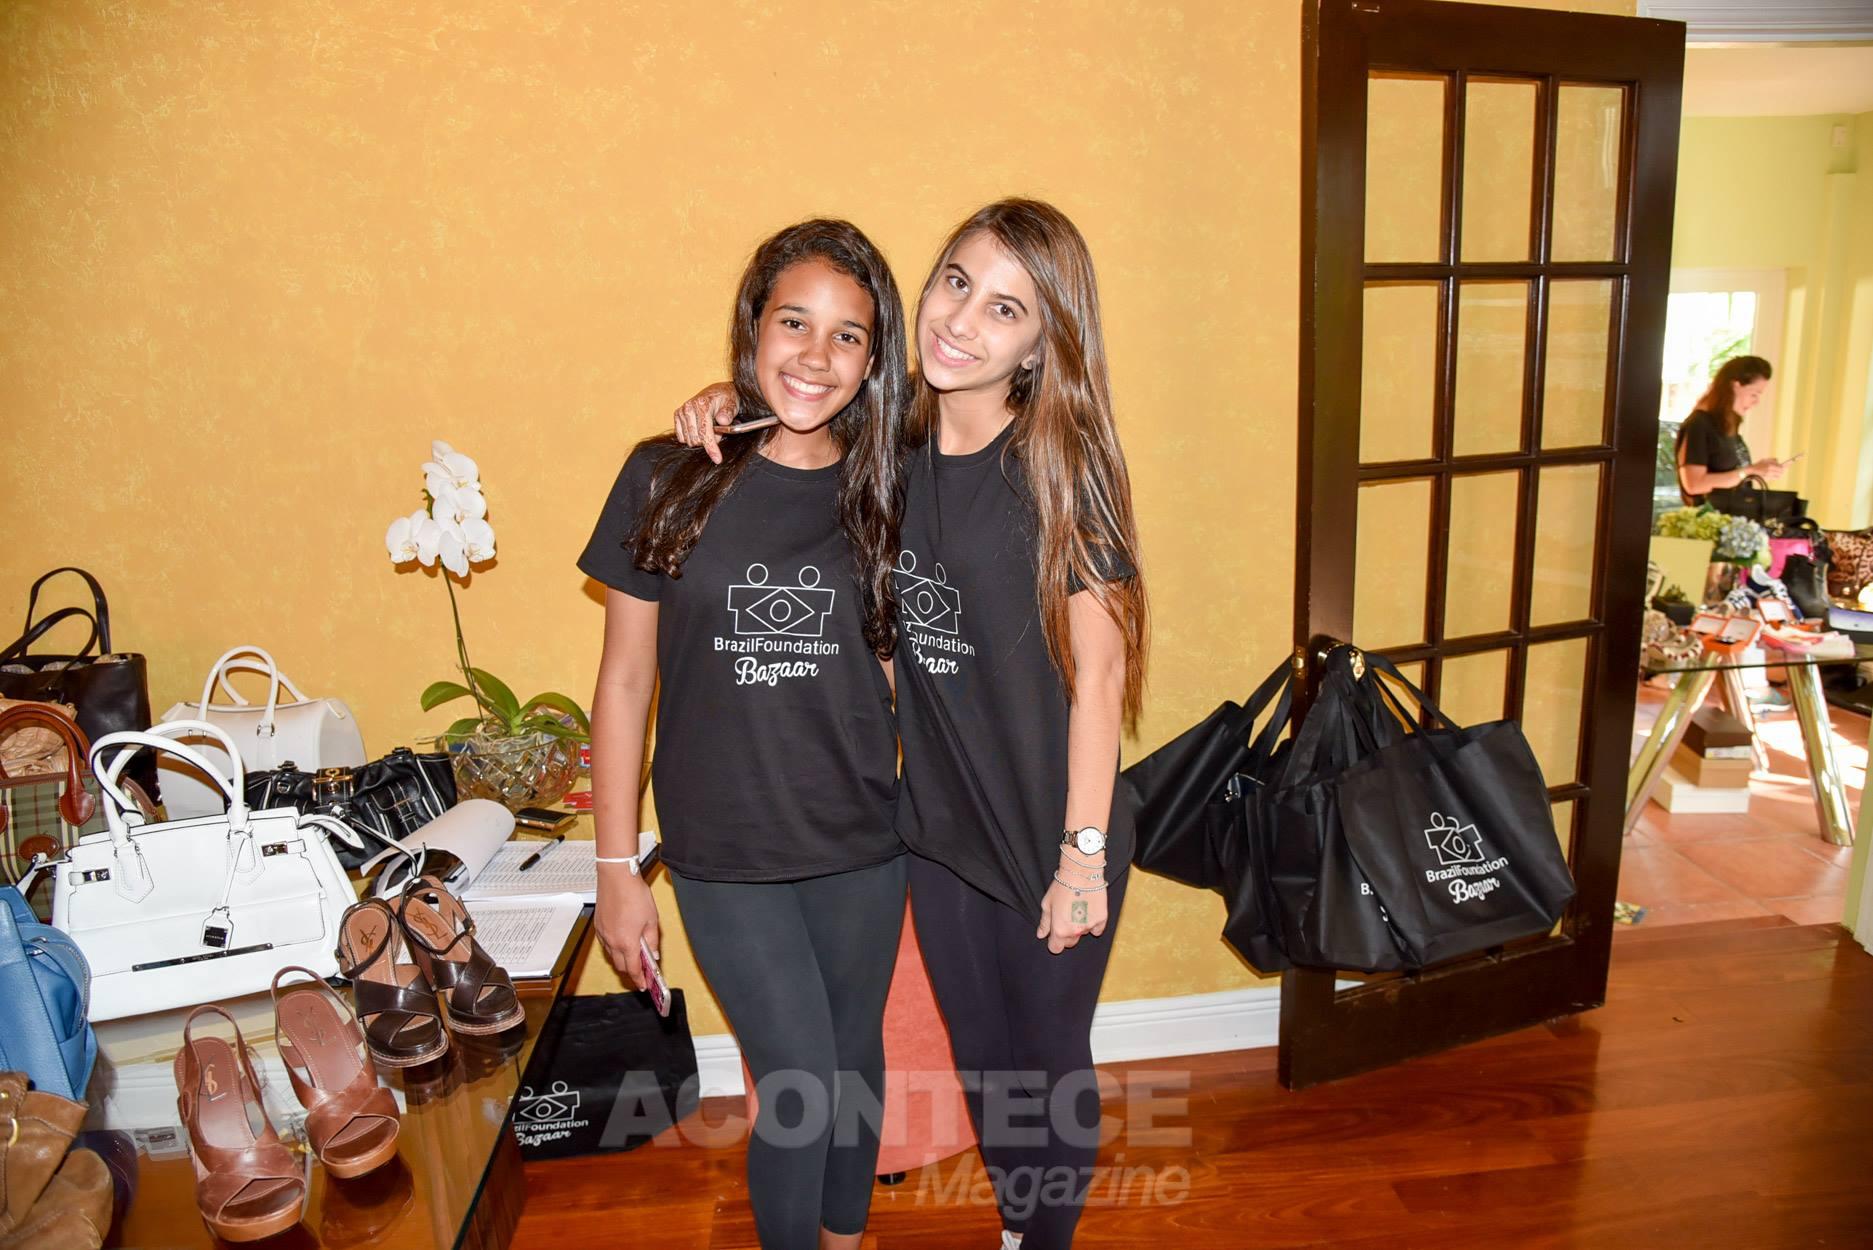 BrazilFoundation Miami Bazaar